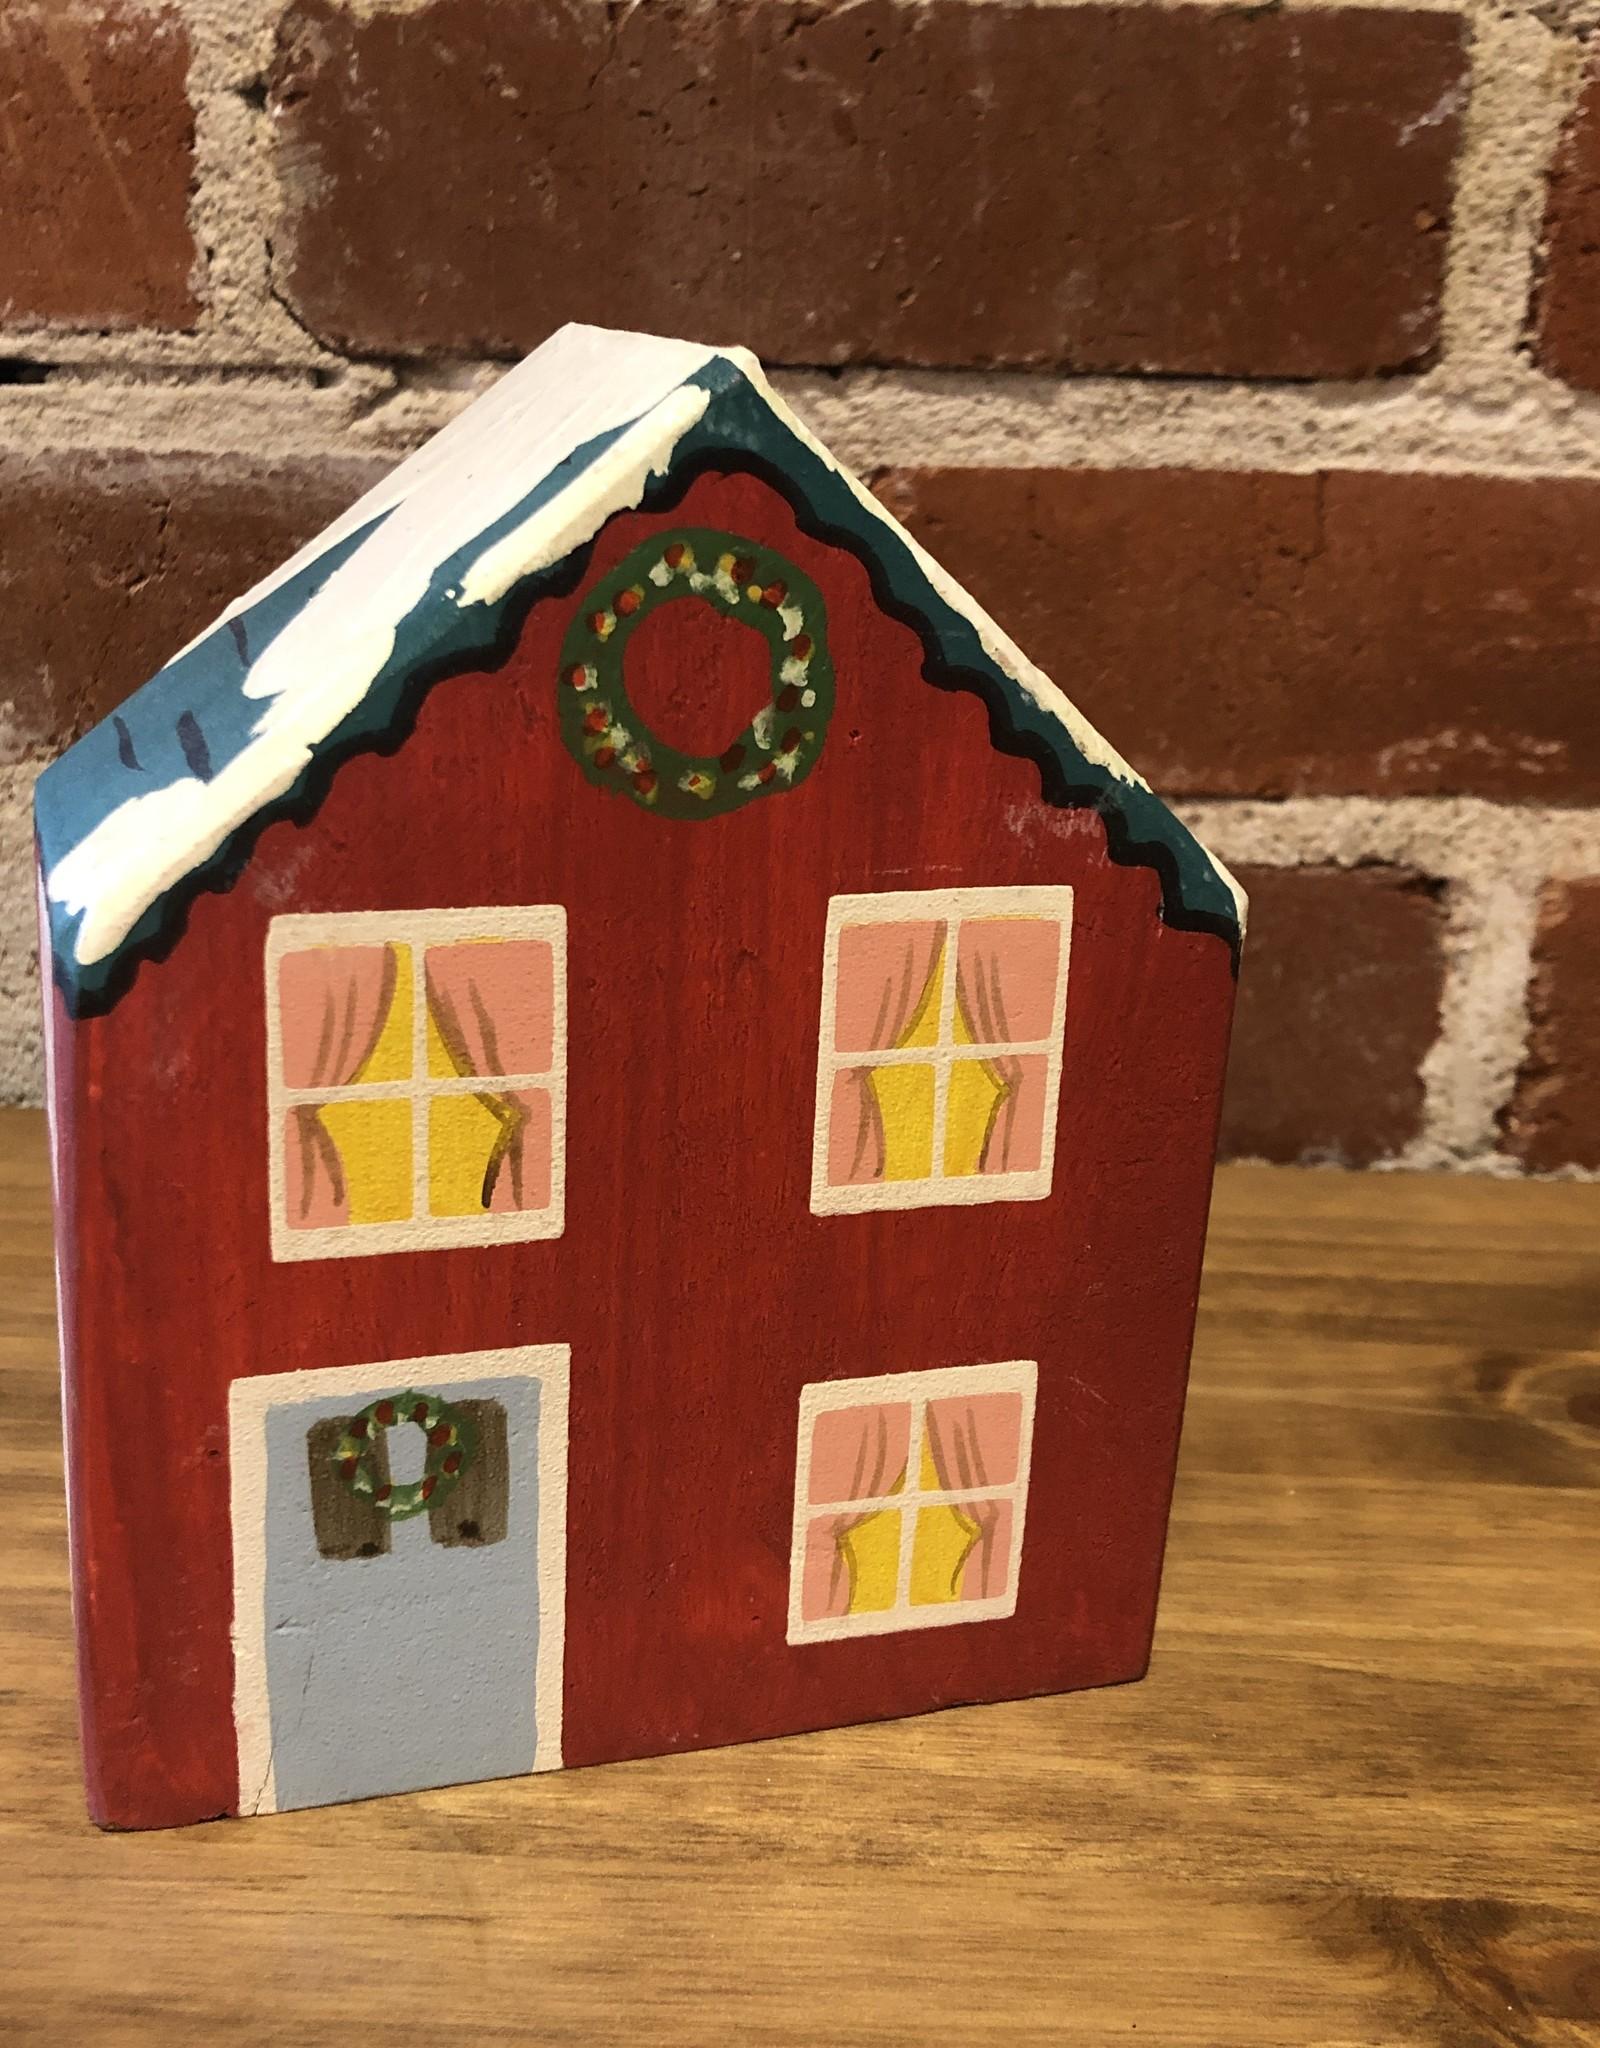 Nordic Village House, Sm set of 4